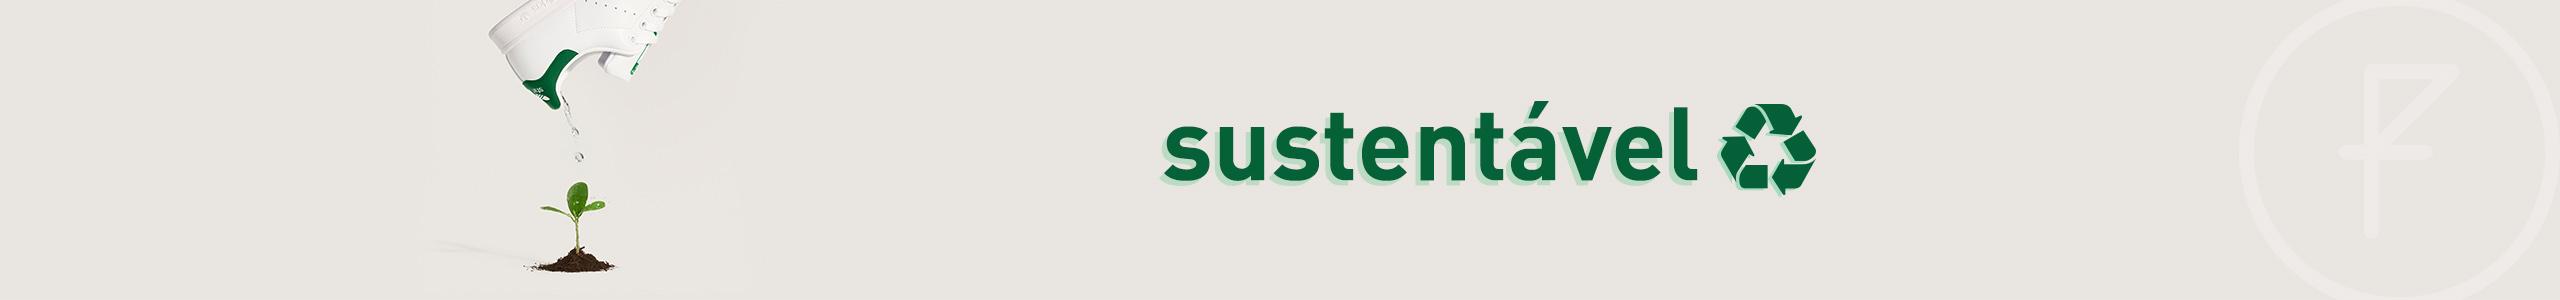 Sustentabilidade | FUXIA